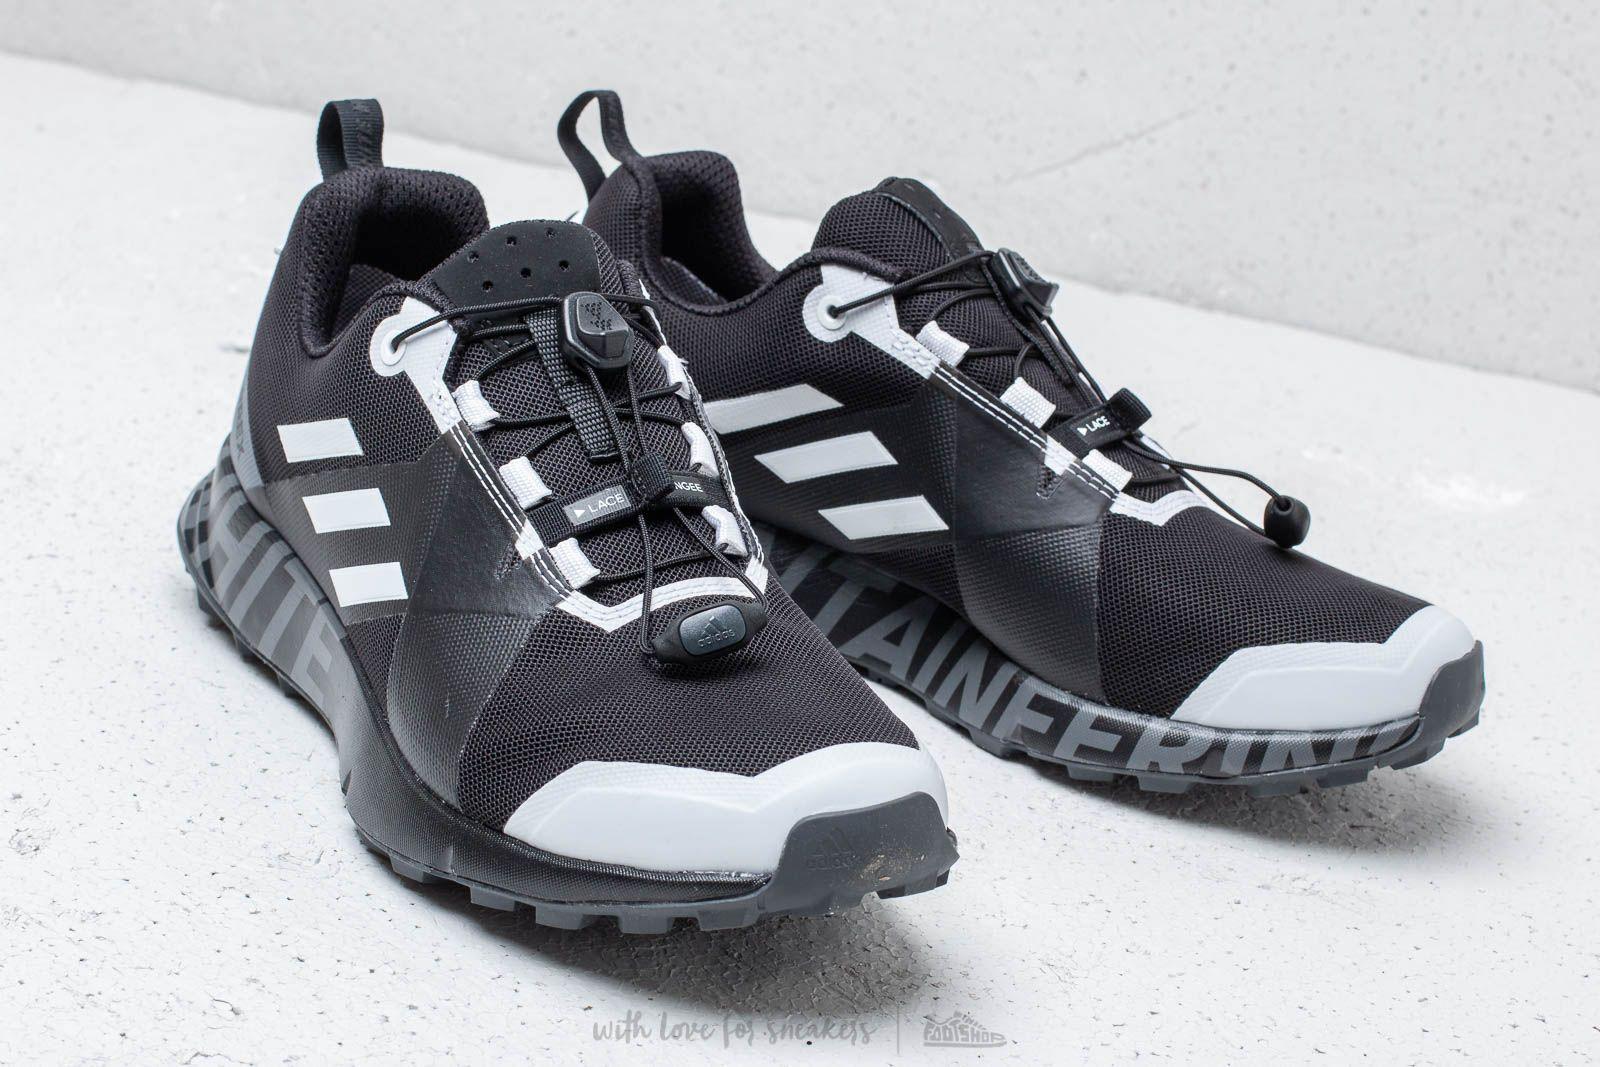 72ce639a004e Adidas x White Mountaineering Terrex Two GTX Carbon  Core Black  Footwear  White at a